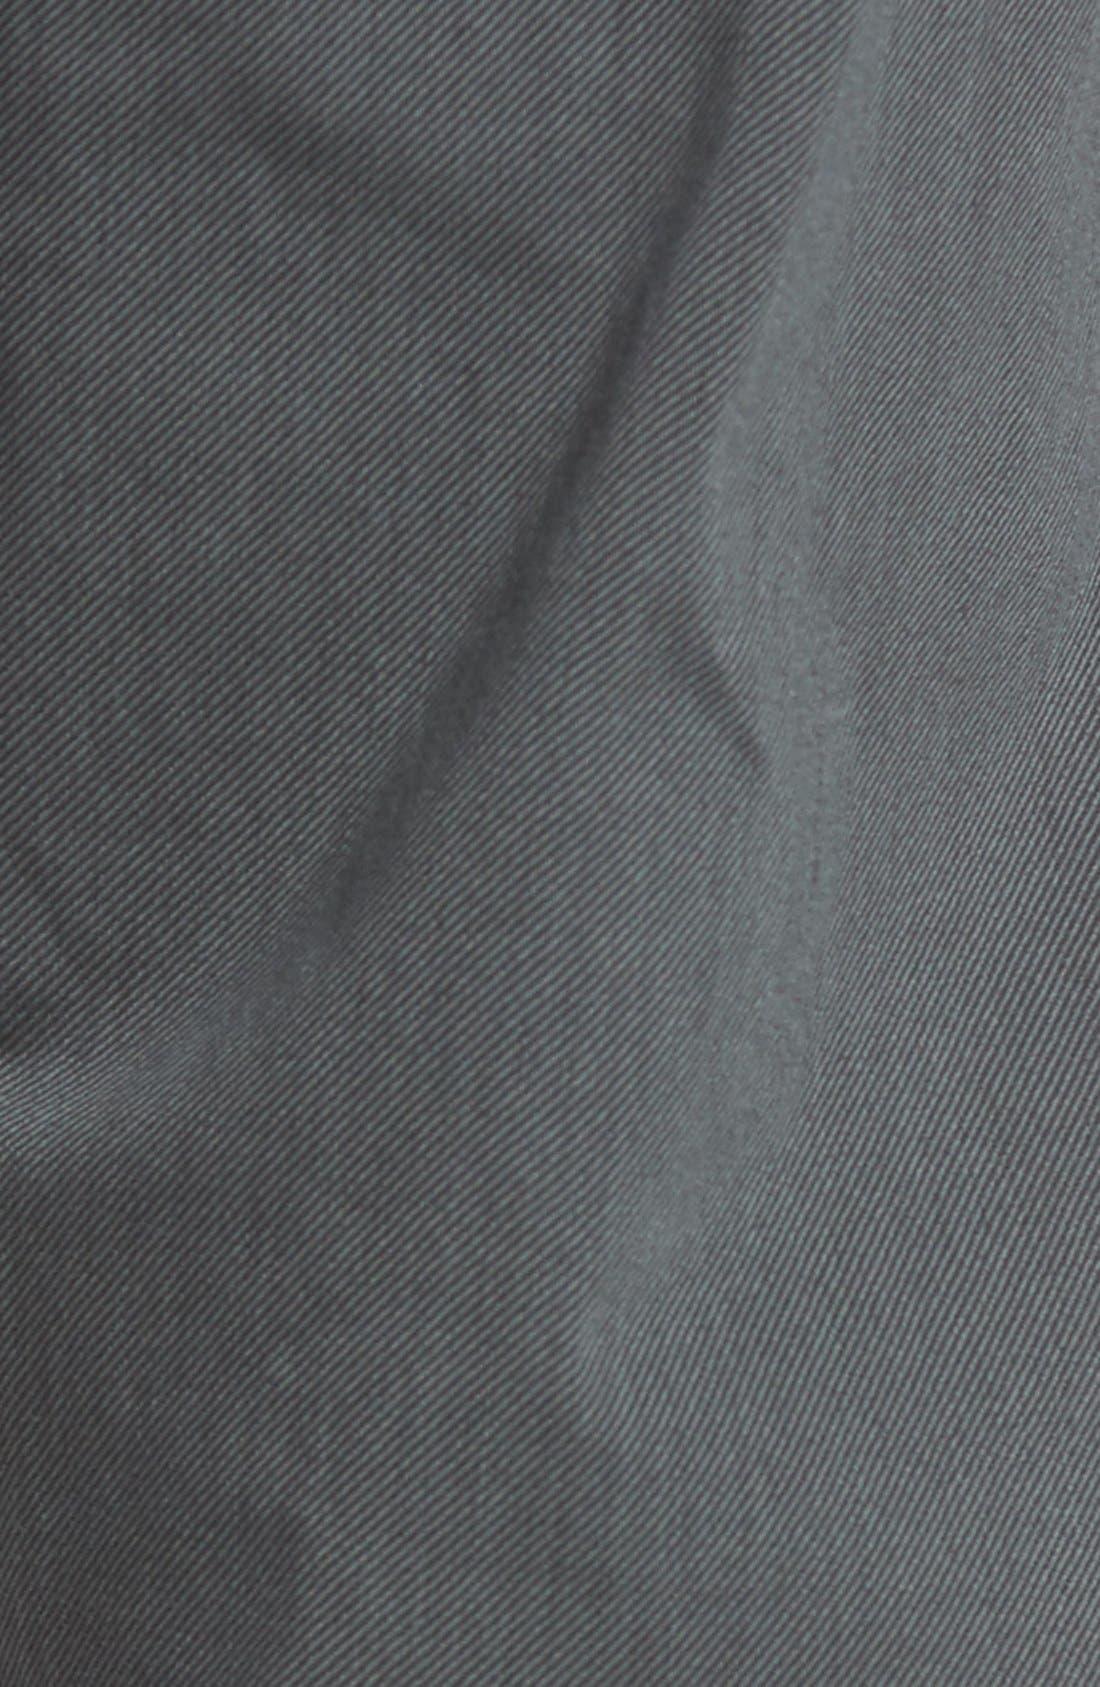 Slim Fit Five-Pocket Pants,                             Alternate thumbnail 5, color,                             017